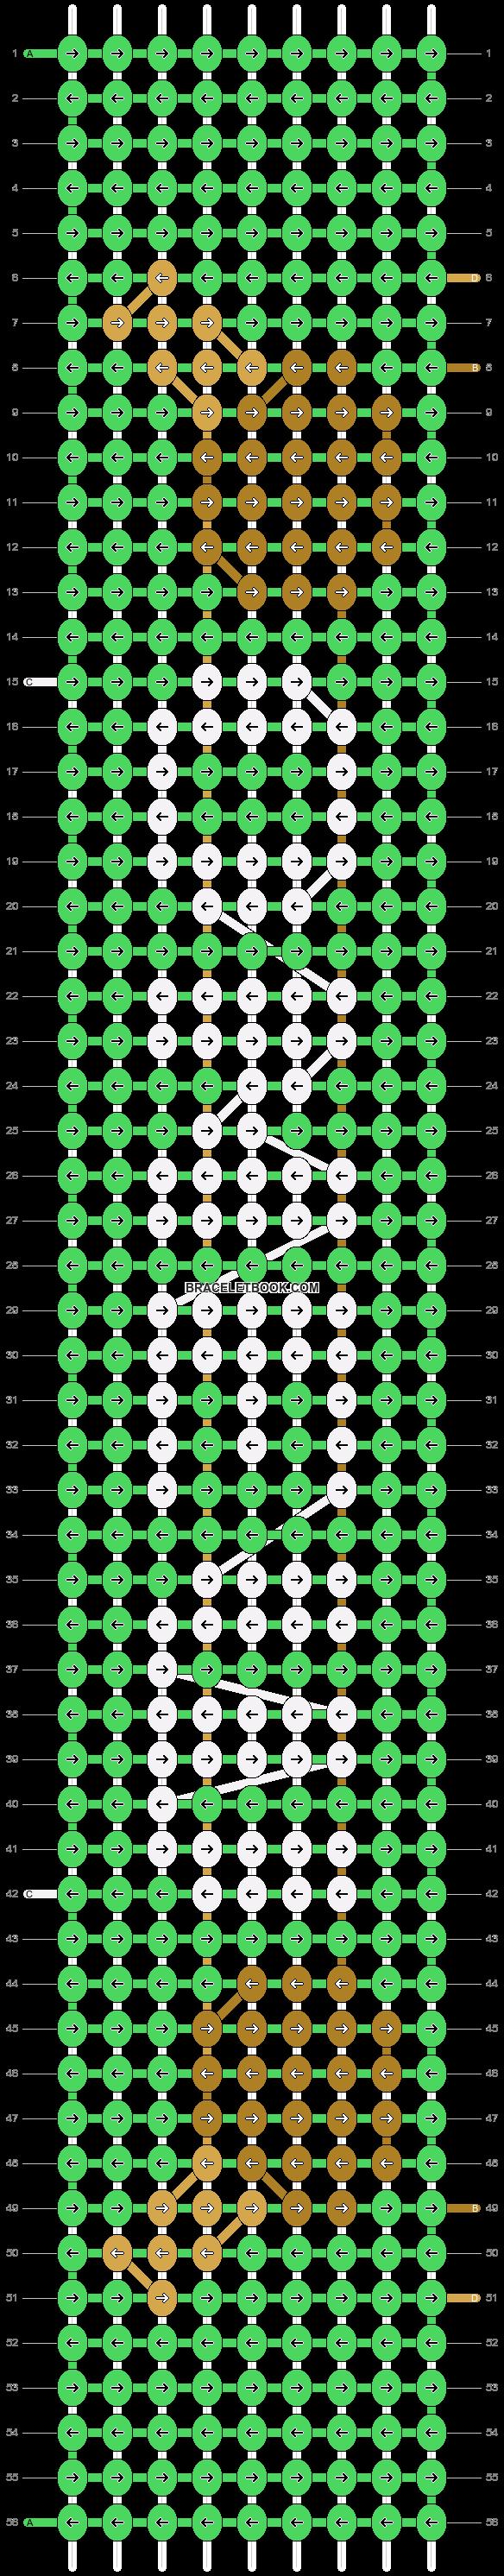 Alpha pattern #6396 pattern